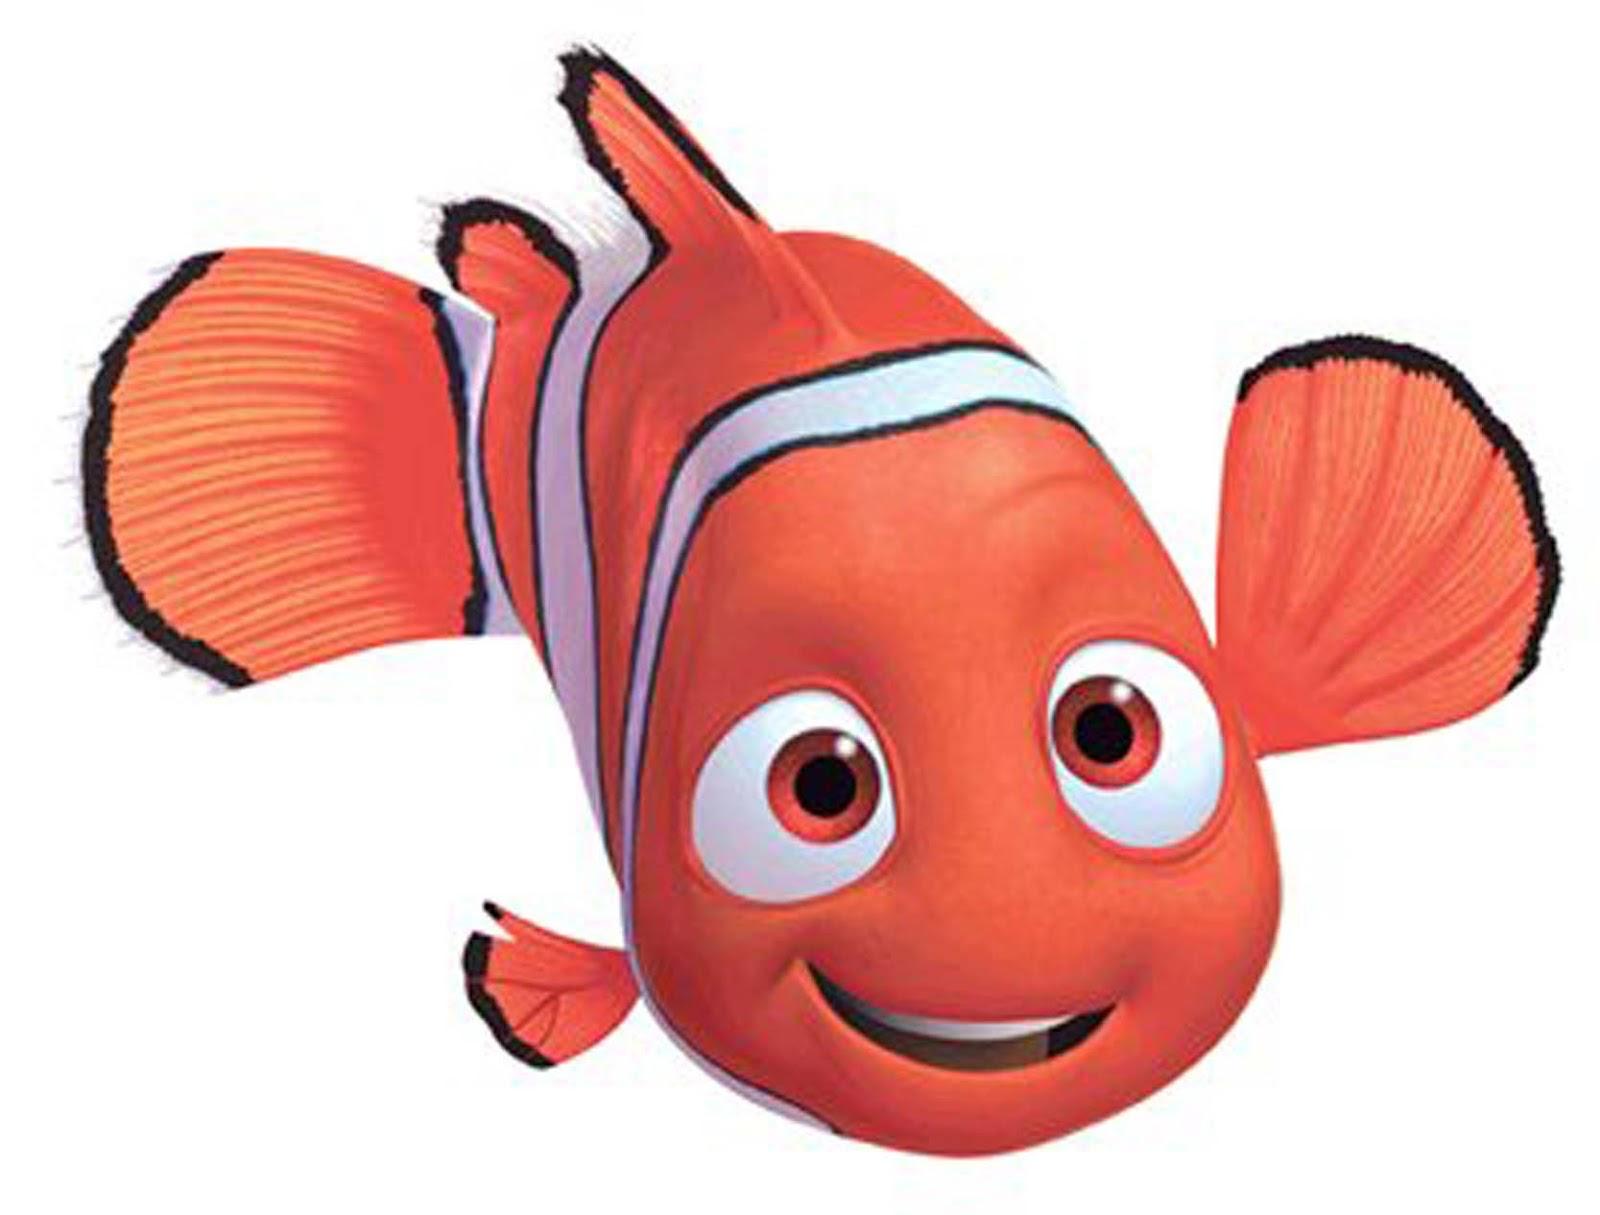 Finding Nemo - Disney Pixar Official Site